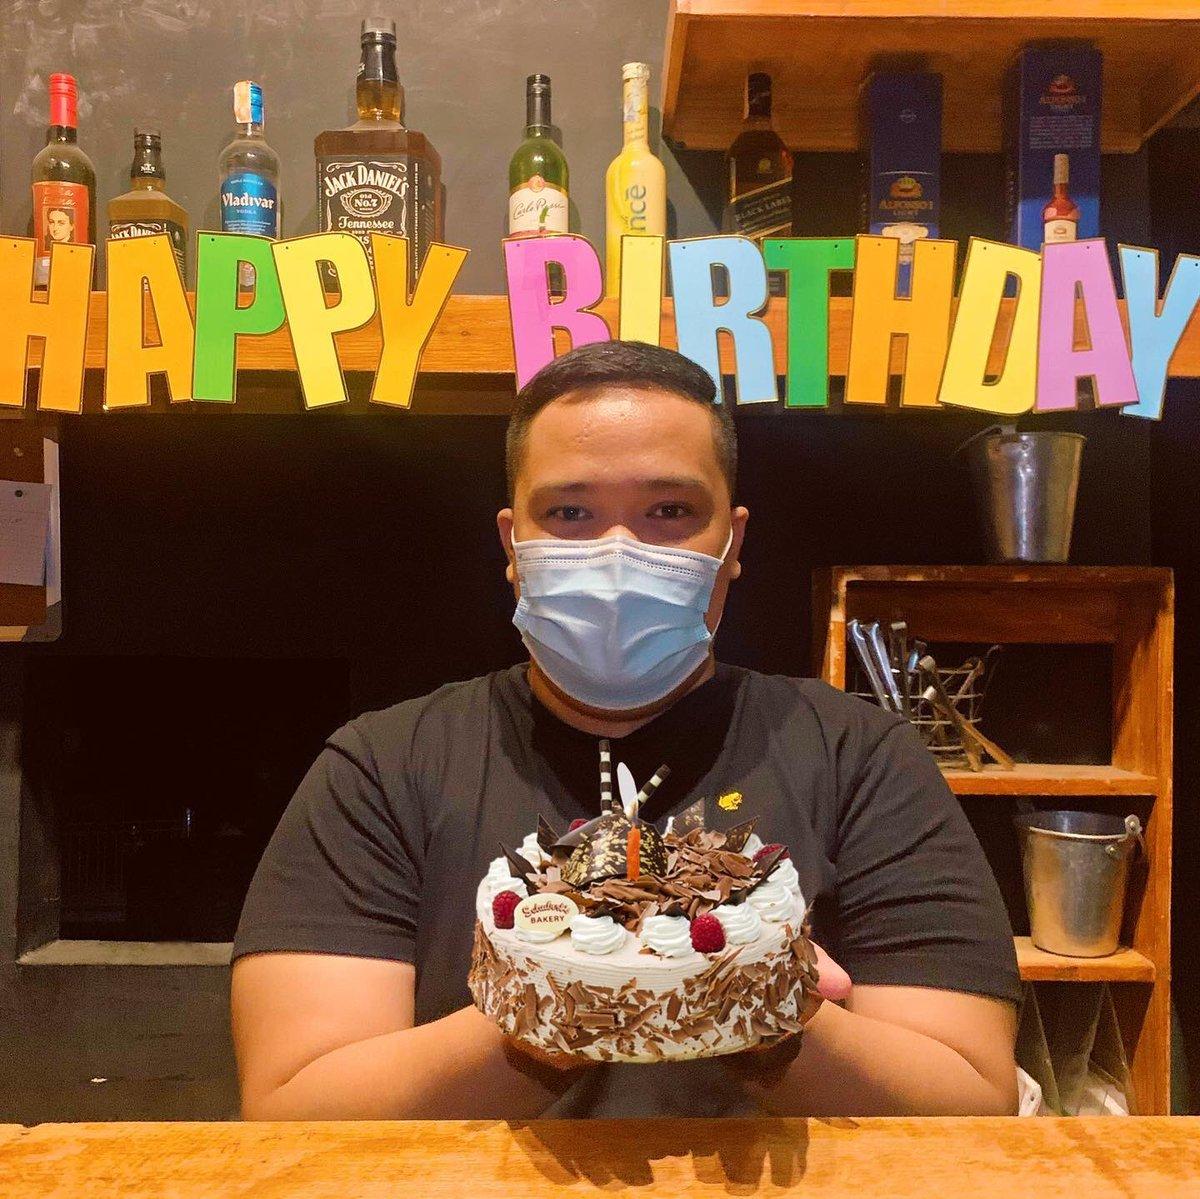 @iamsheilfree Happy birthday po idle